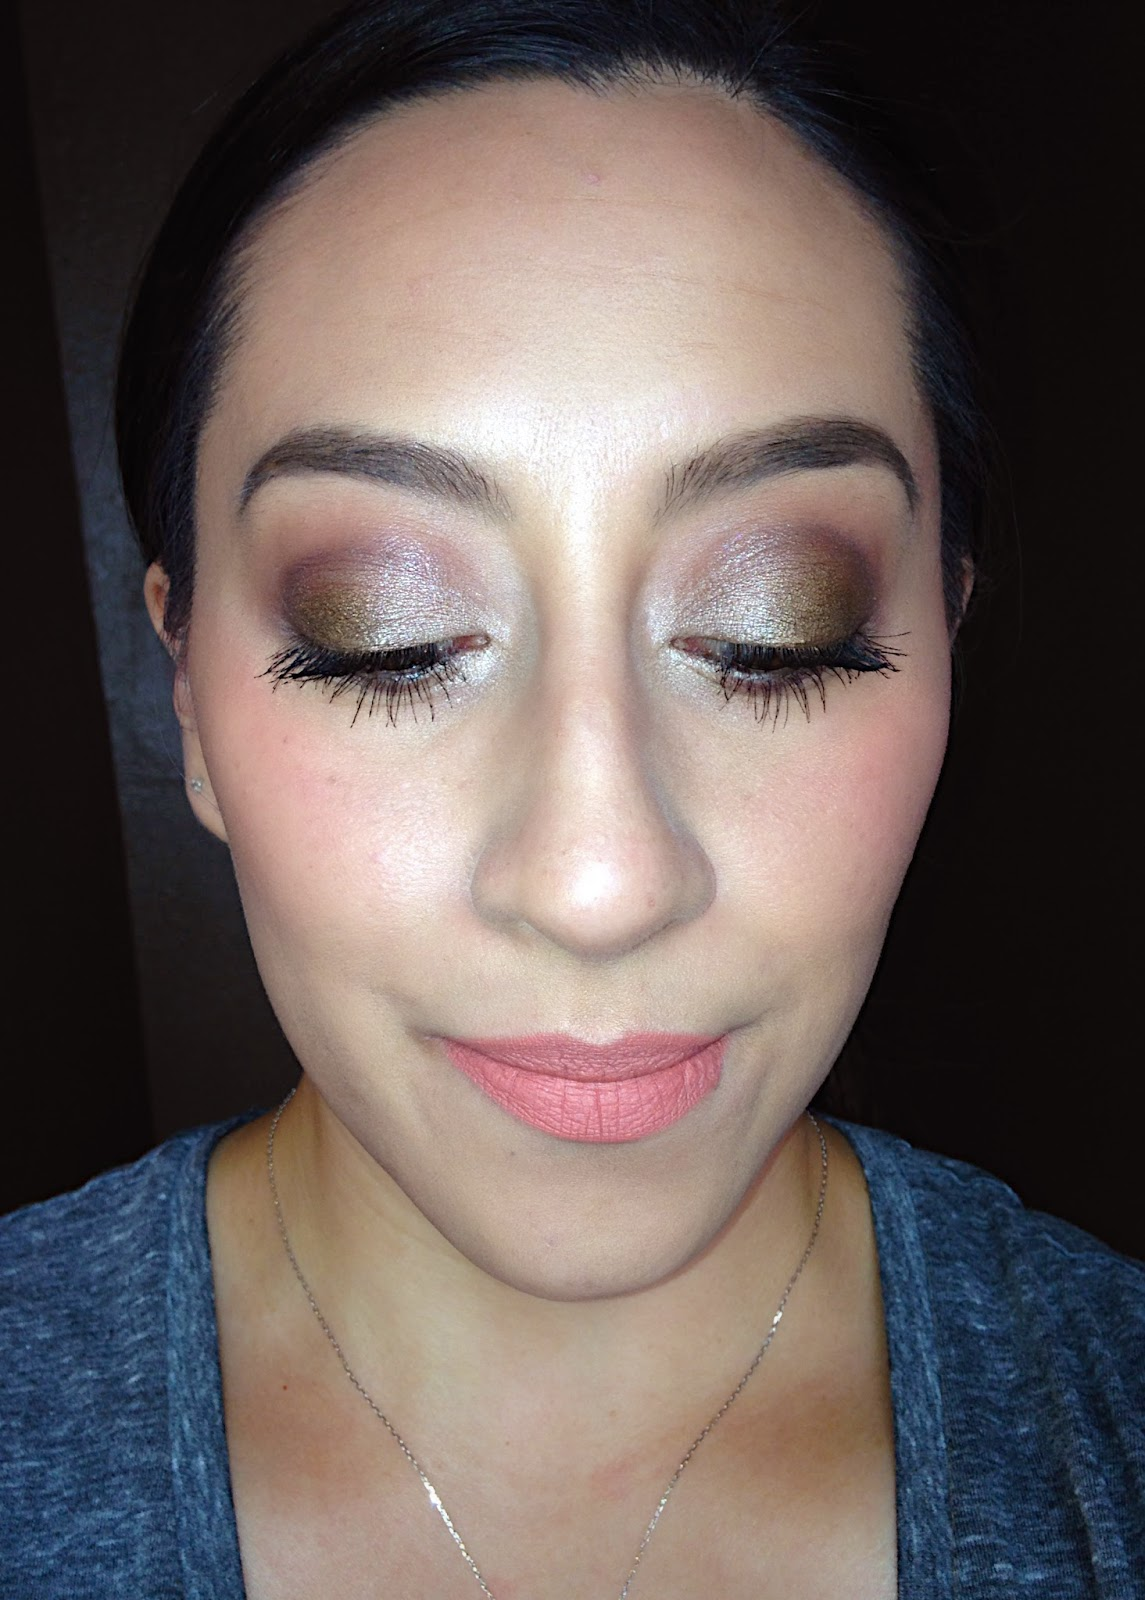 Camo eye look using BH Cosmetics Dark Rose palette